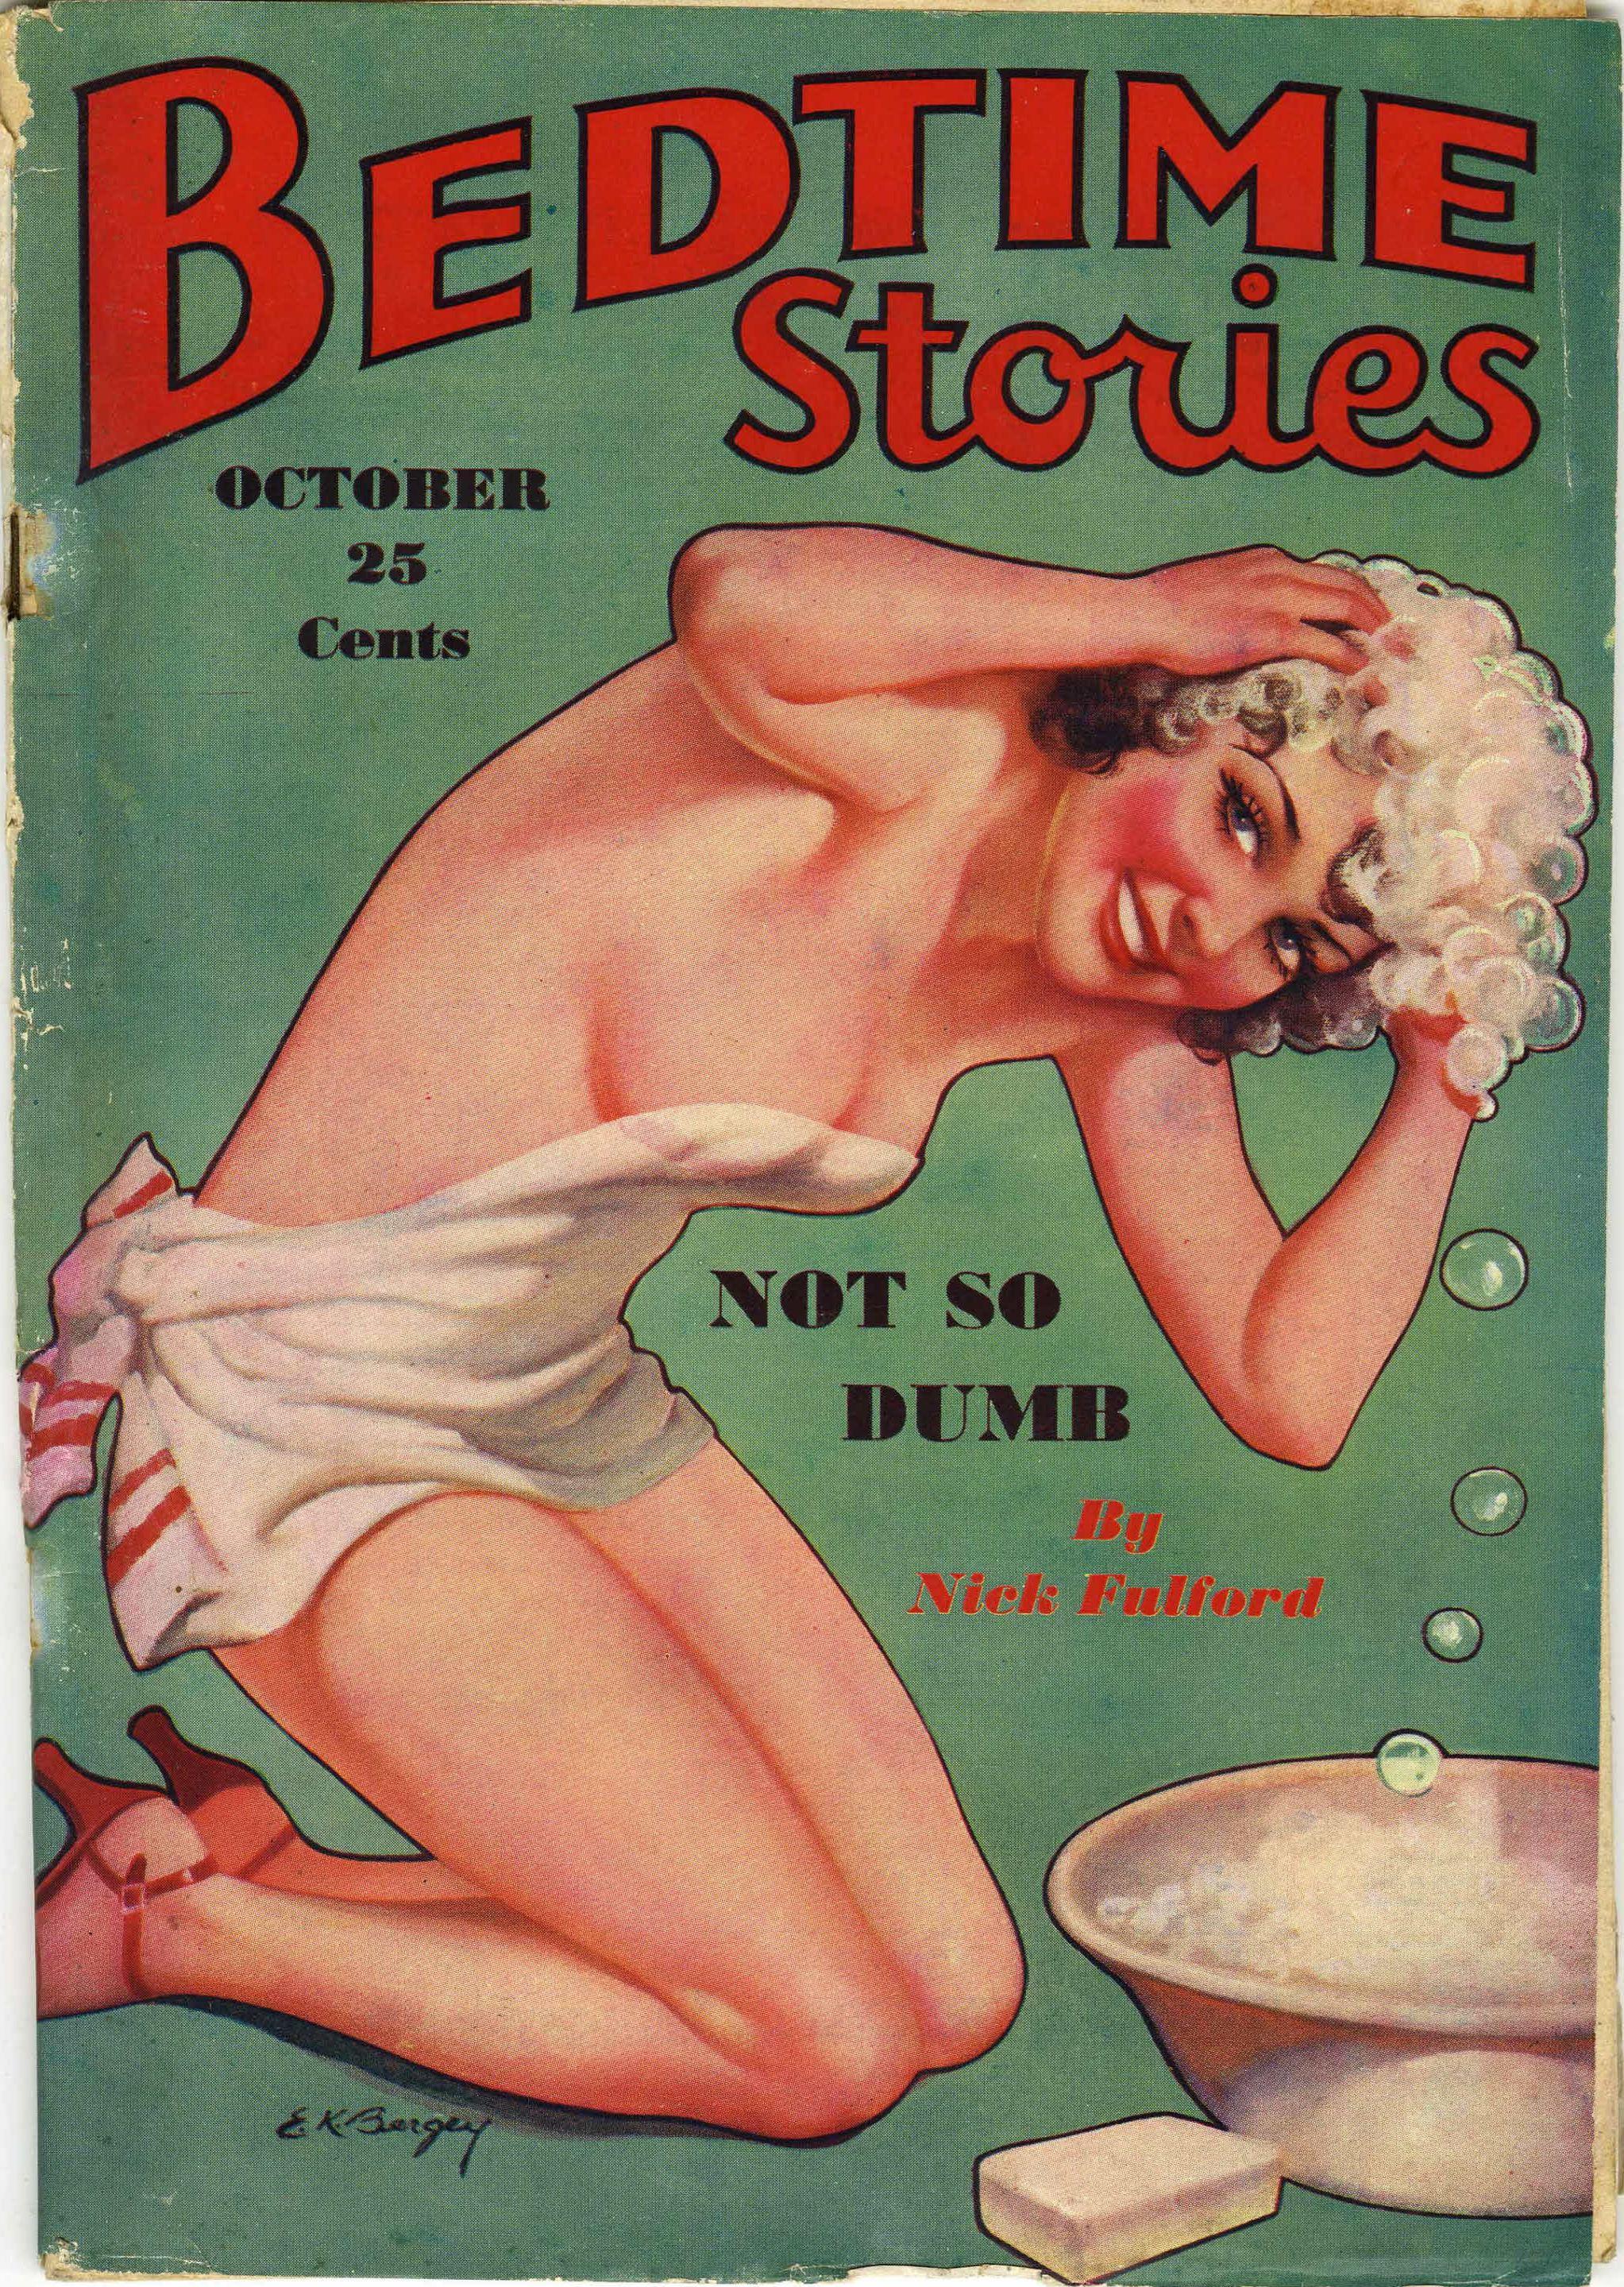 33090119-Bedtime_Stories_V3#12_(Detinuer_Publishing_Co.,_1935)